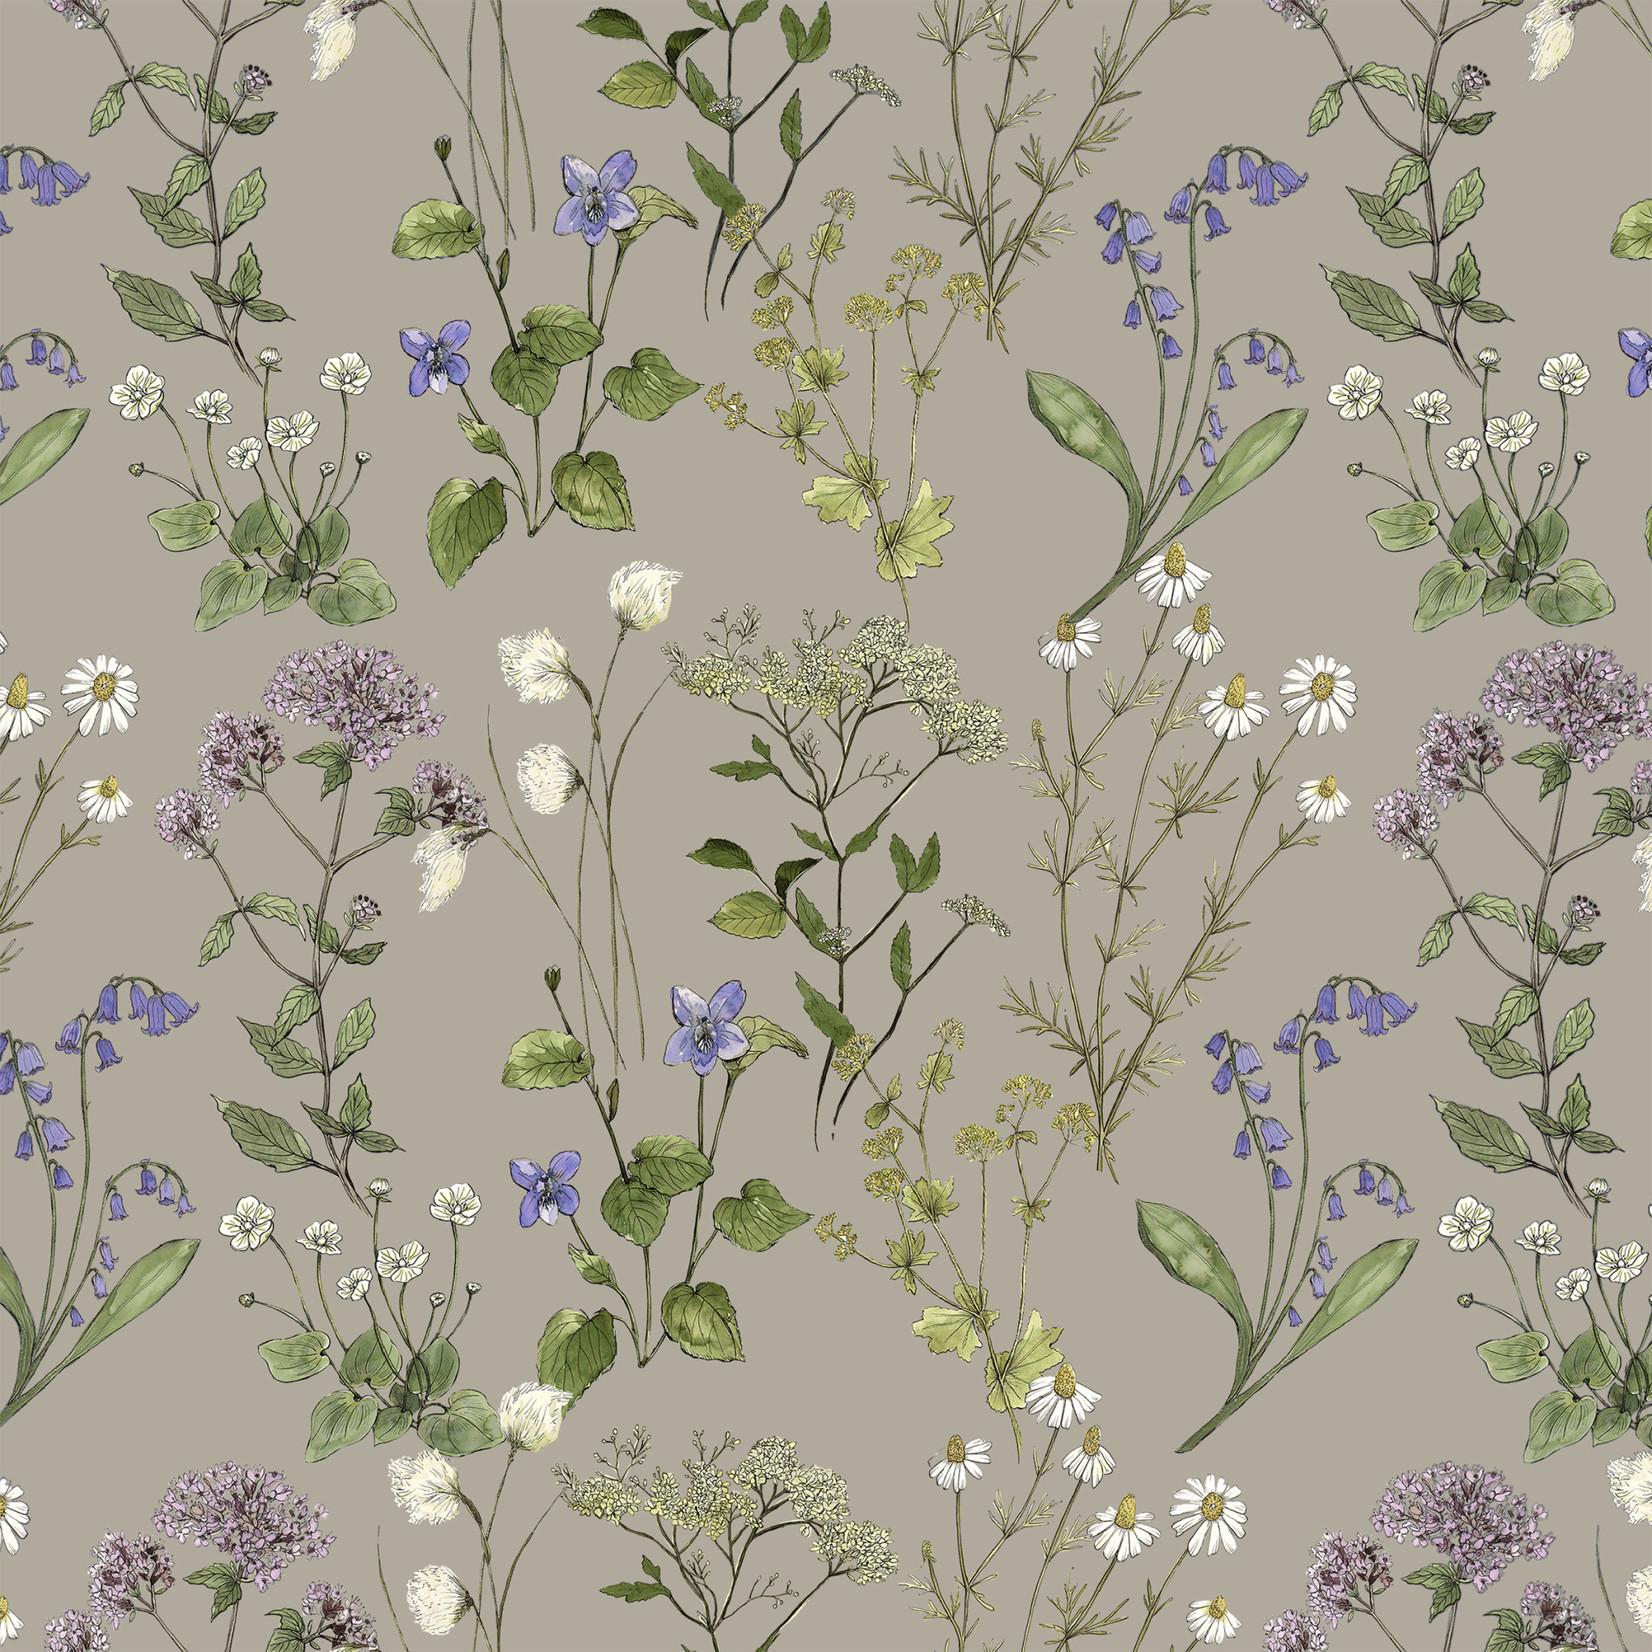 Windham Fabrics Midsummer - Meadow Sweet - Stone